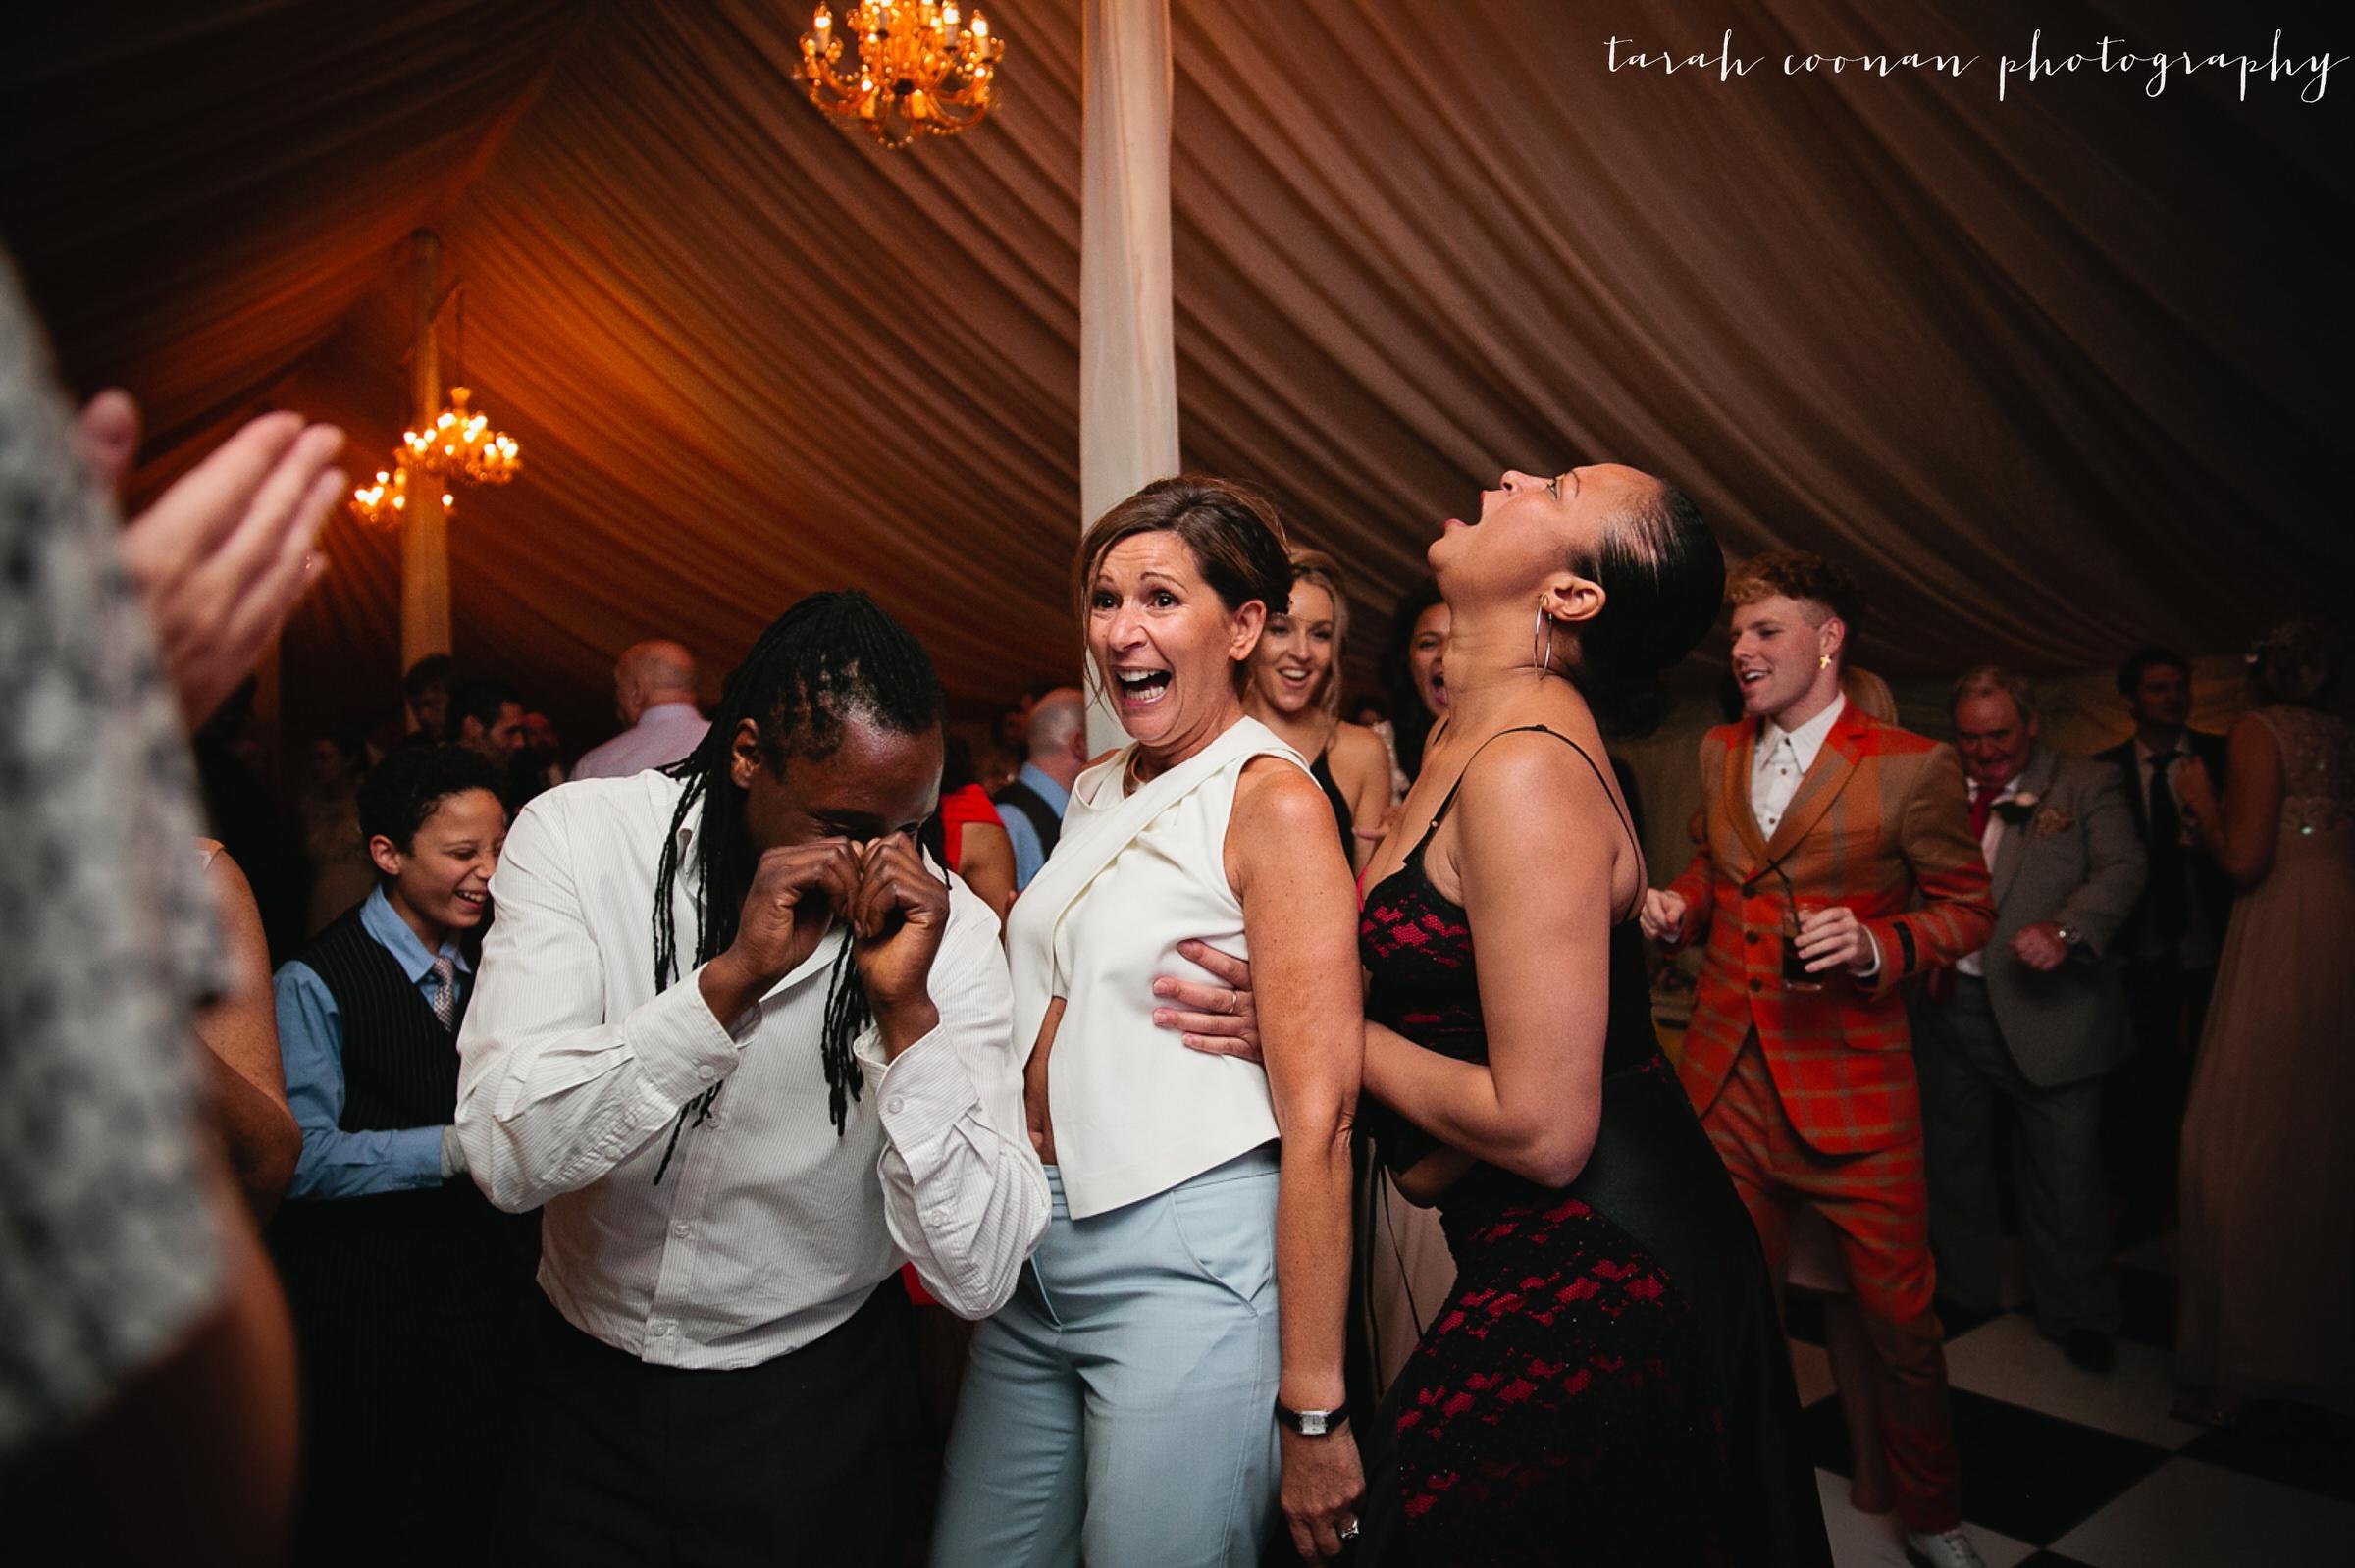 brighton-wedding-photographer117